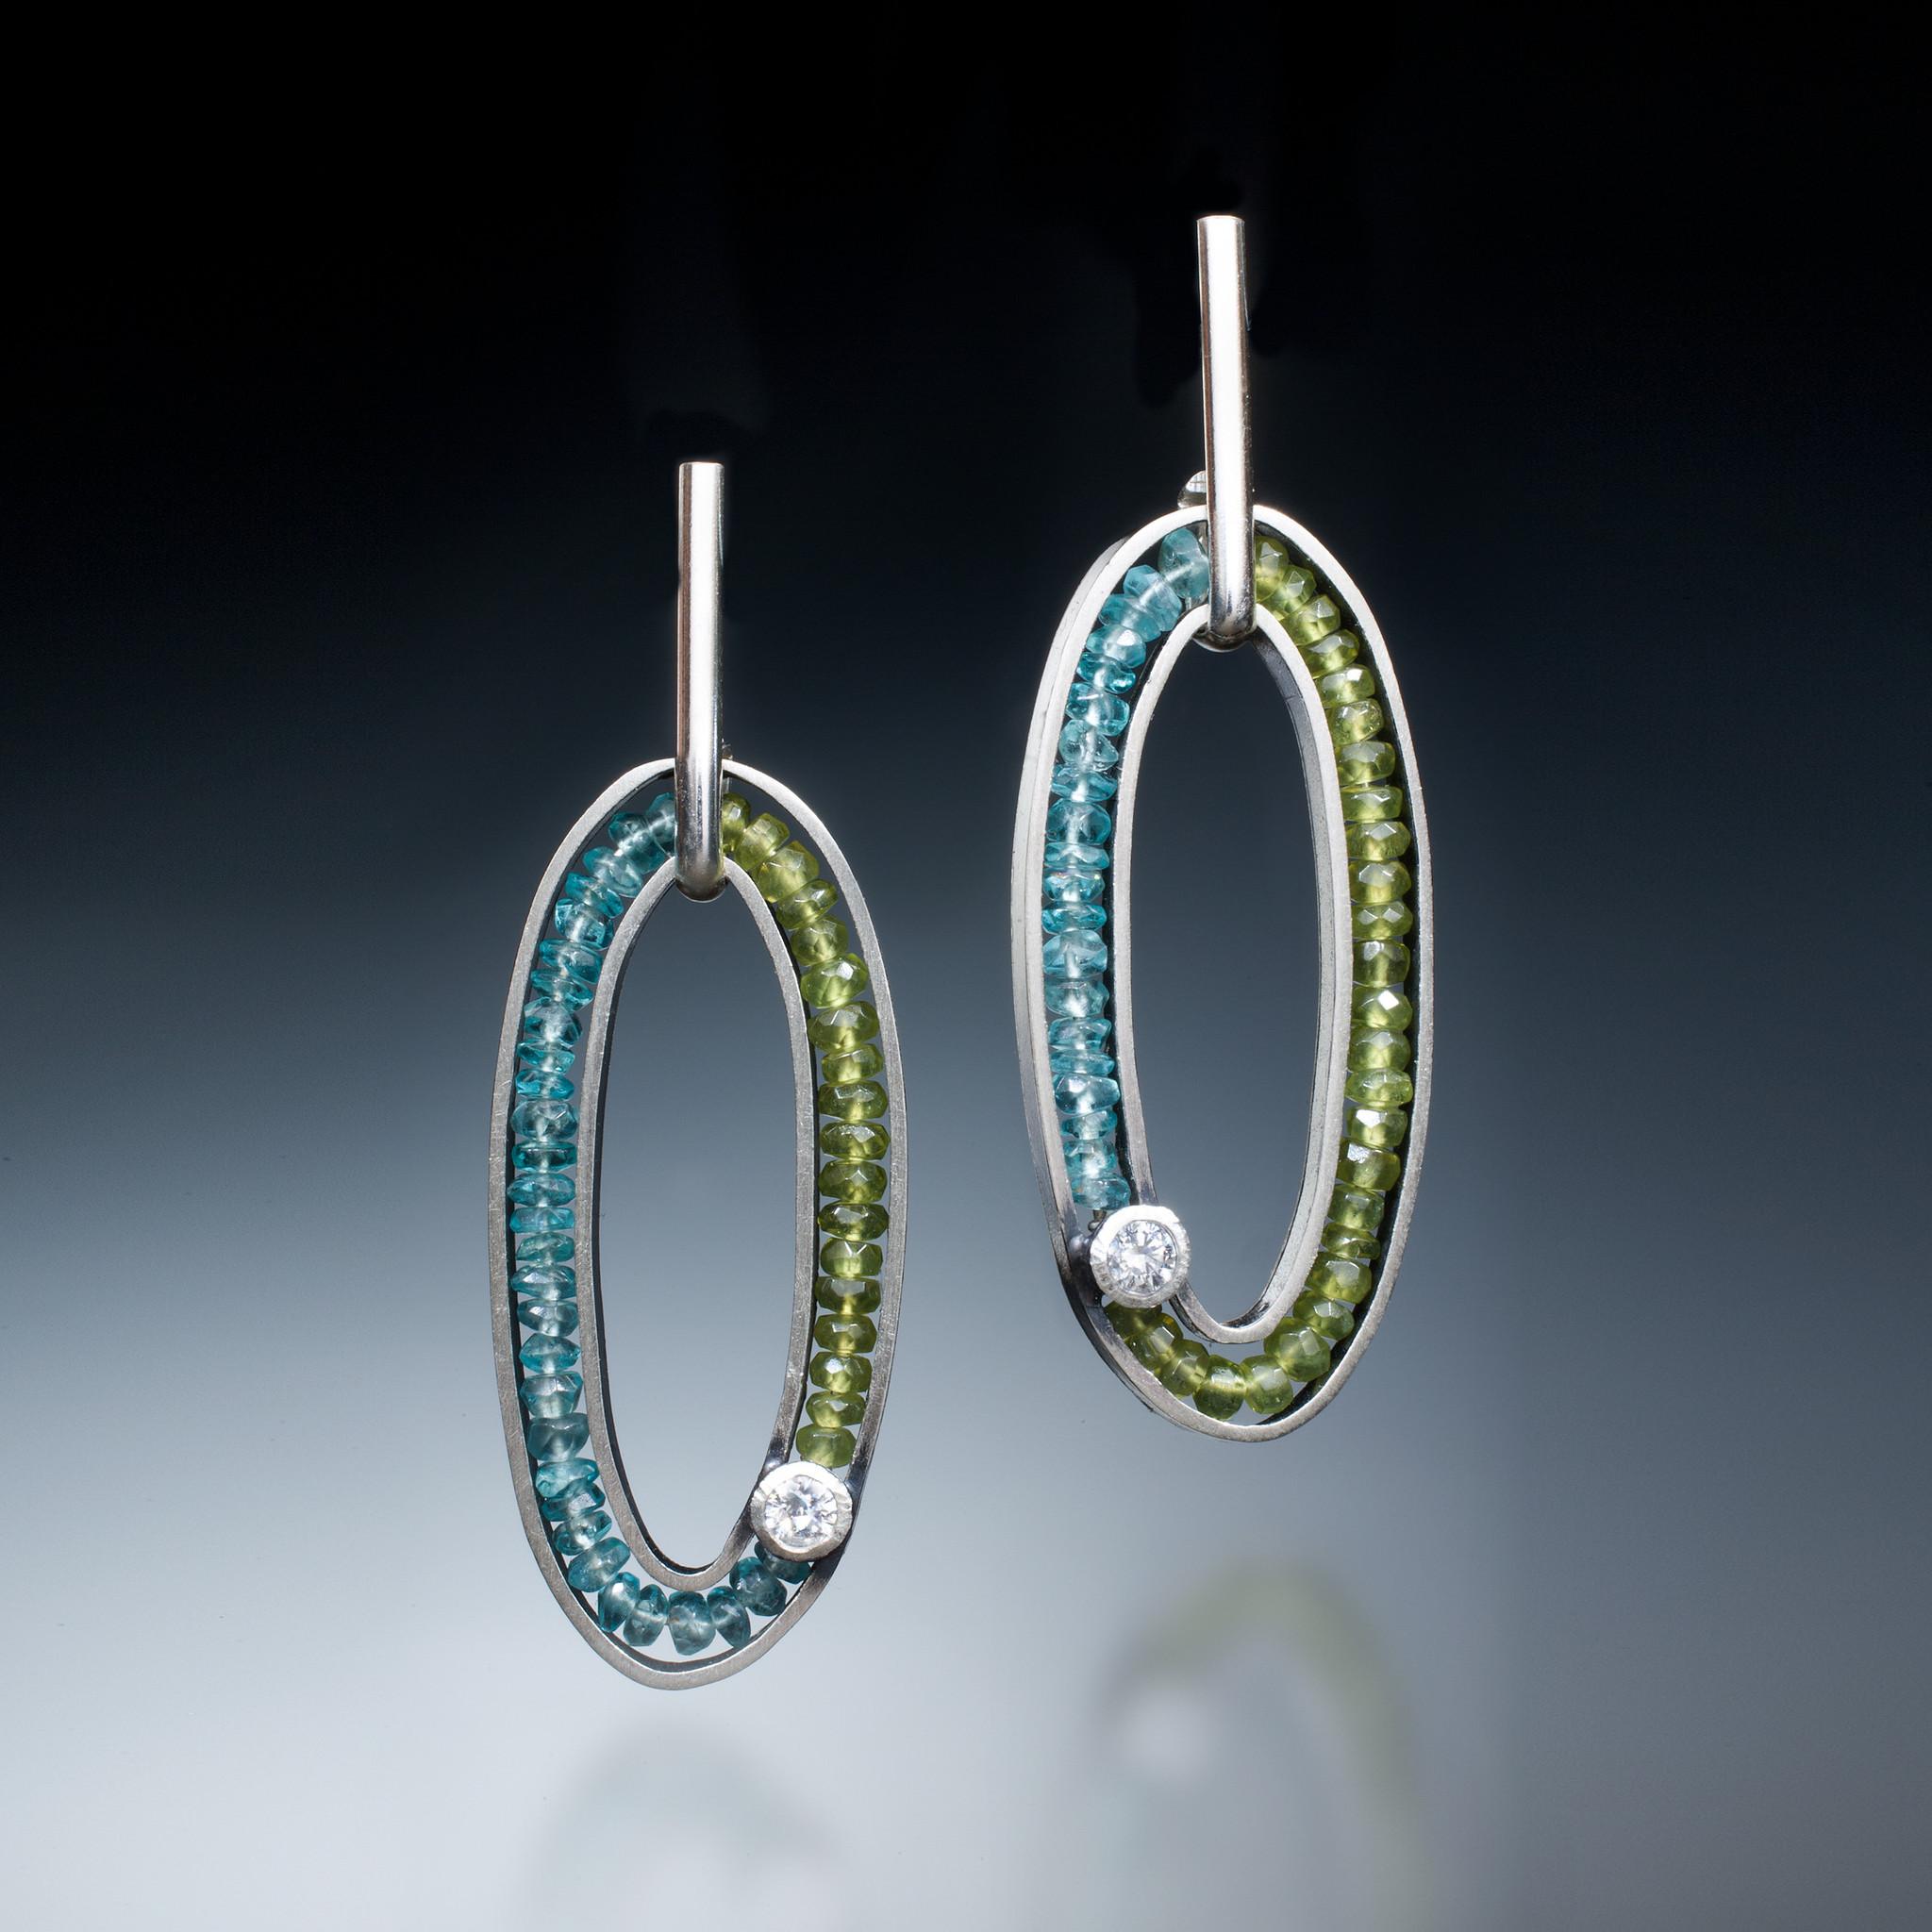 Gemstone_oval_earrings_b.jpg